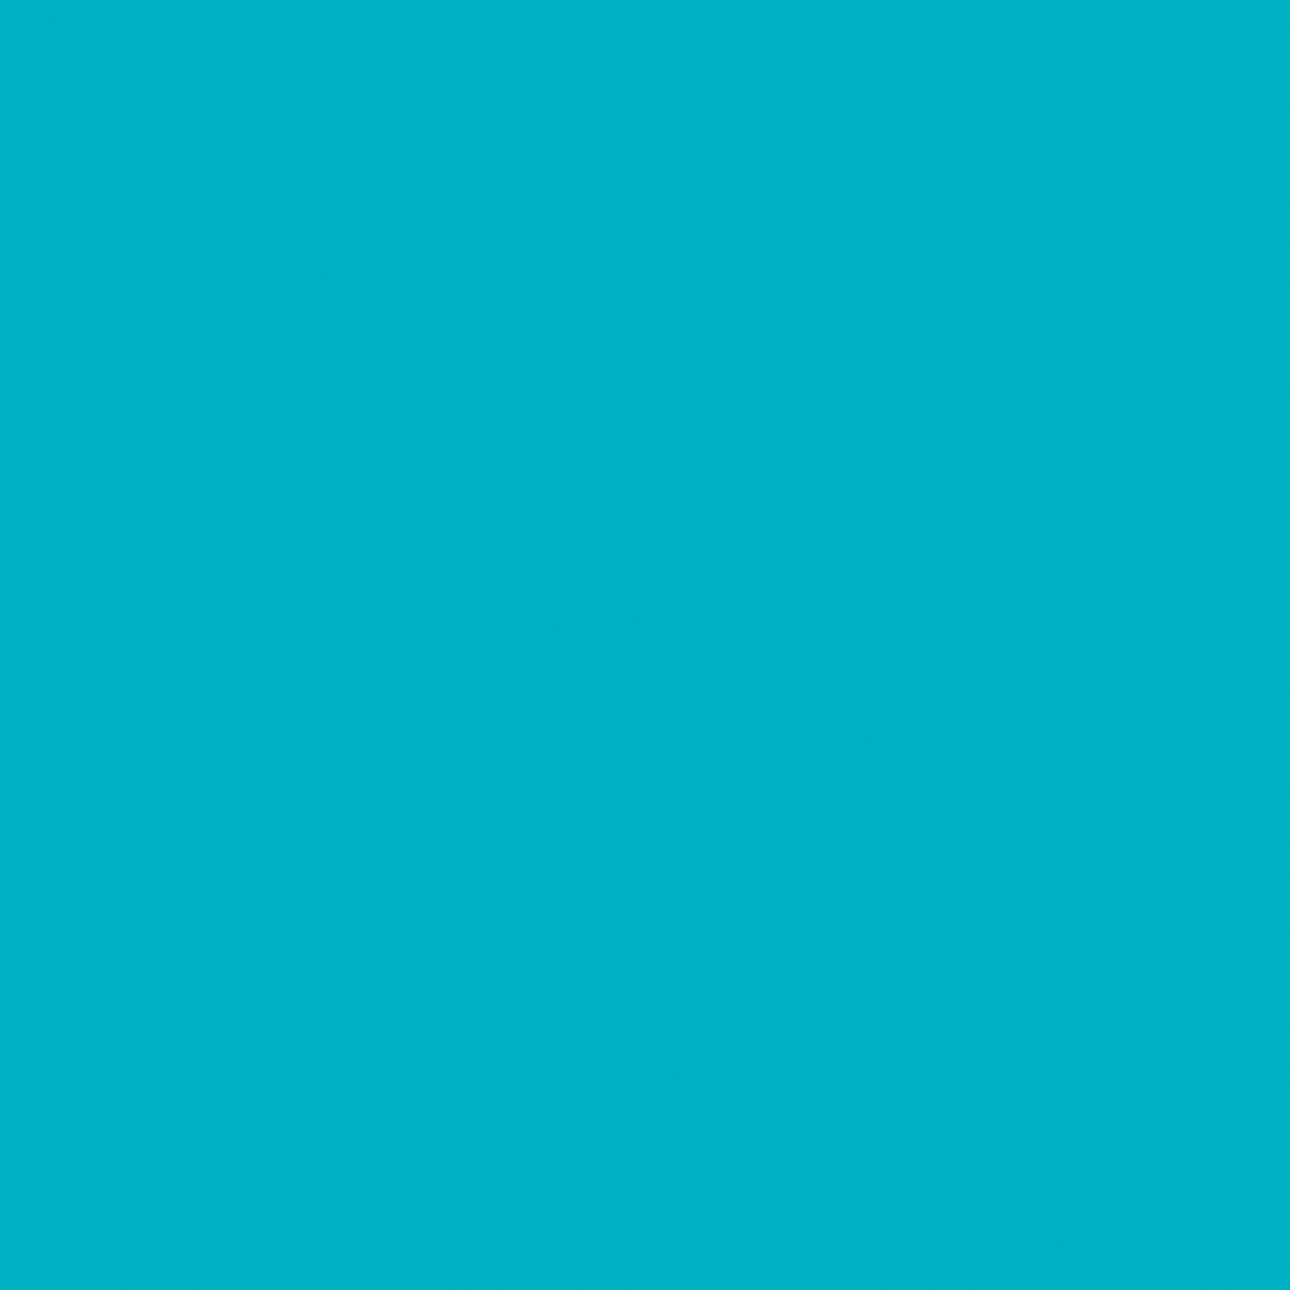 Aquablau